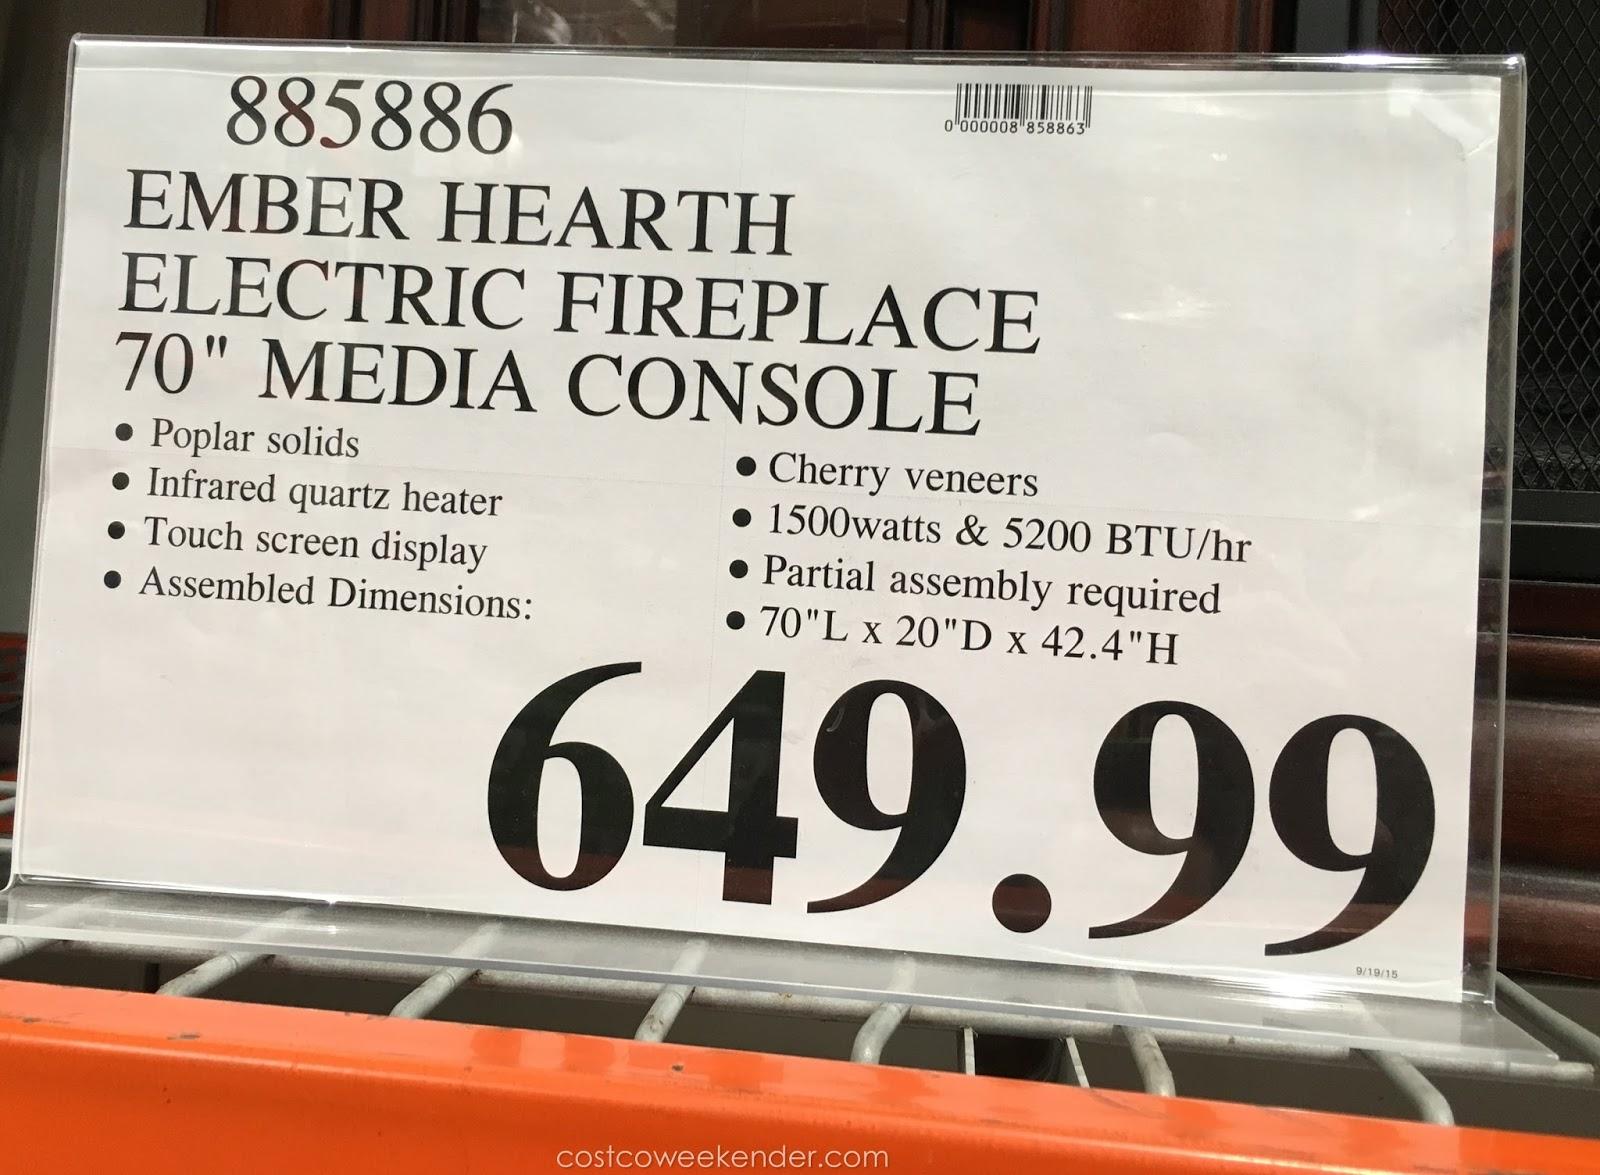 Ember Hearth Electric Media Fireplace Costco Weekender Rh Costcoweekender Com